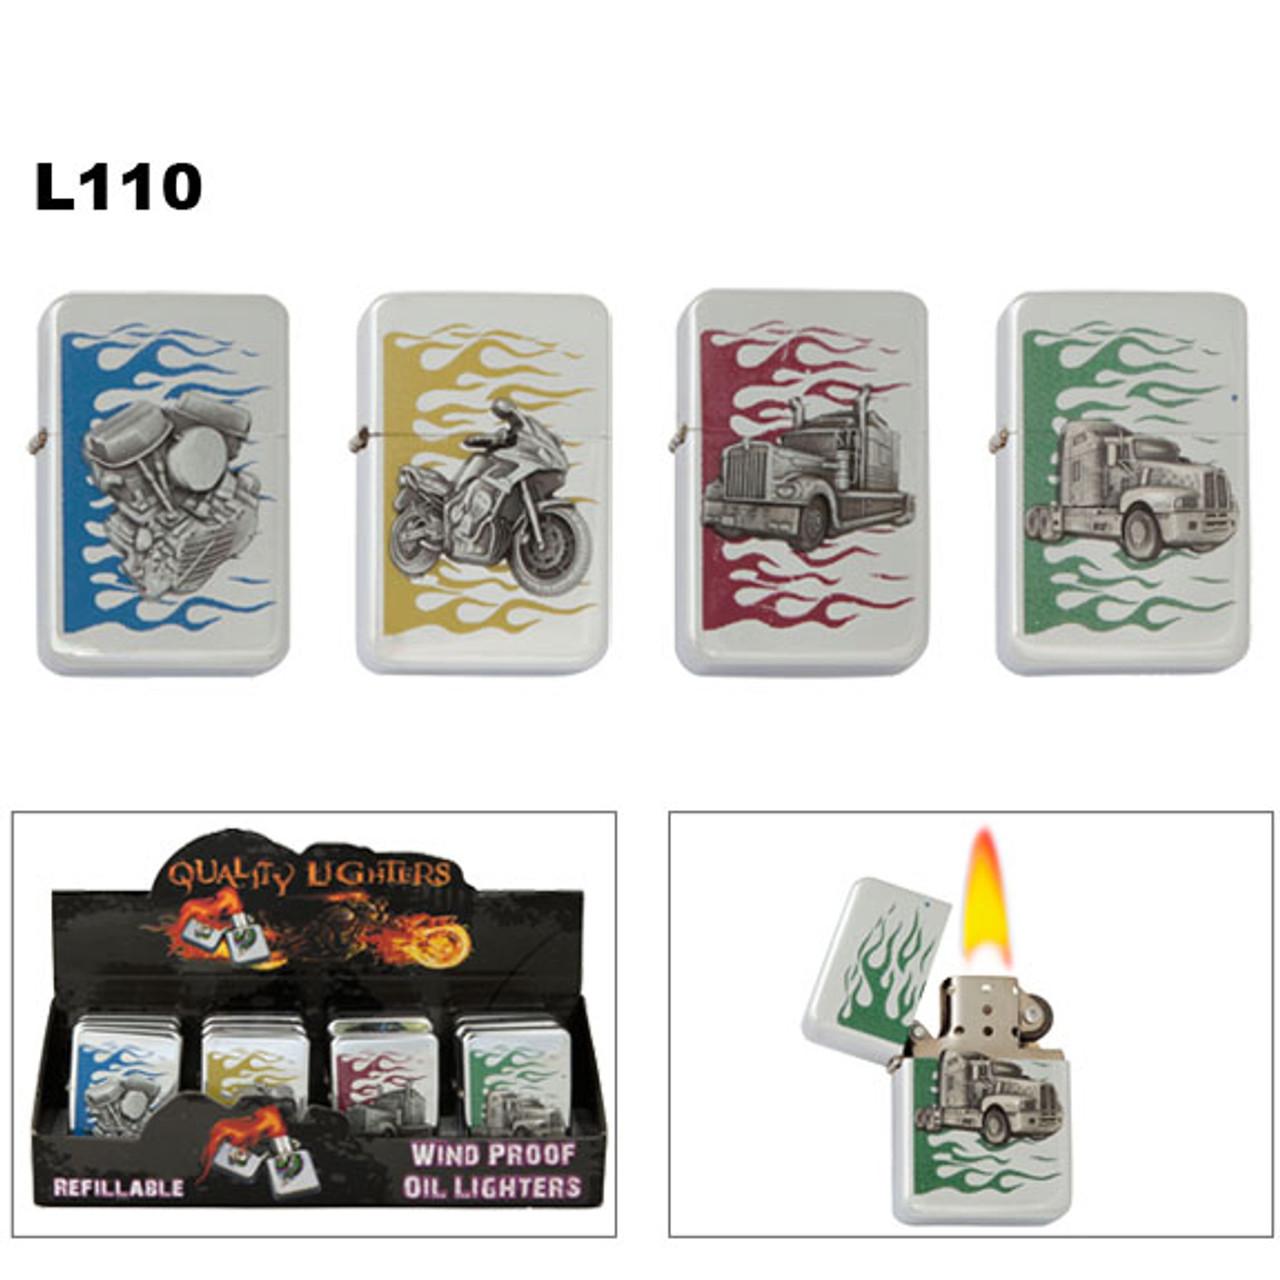 Wholesale Oil Lighters | Flames | Assorted Emblems